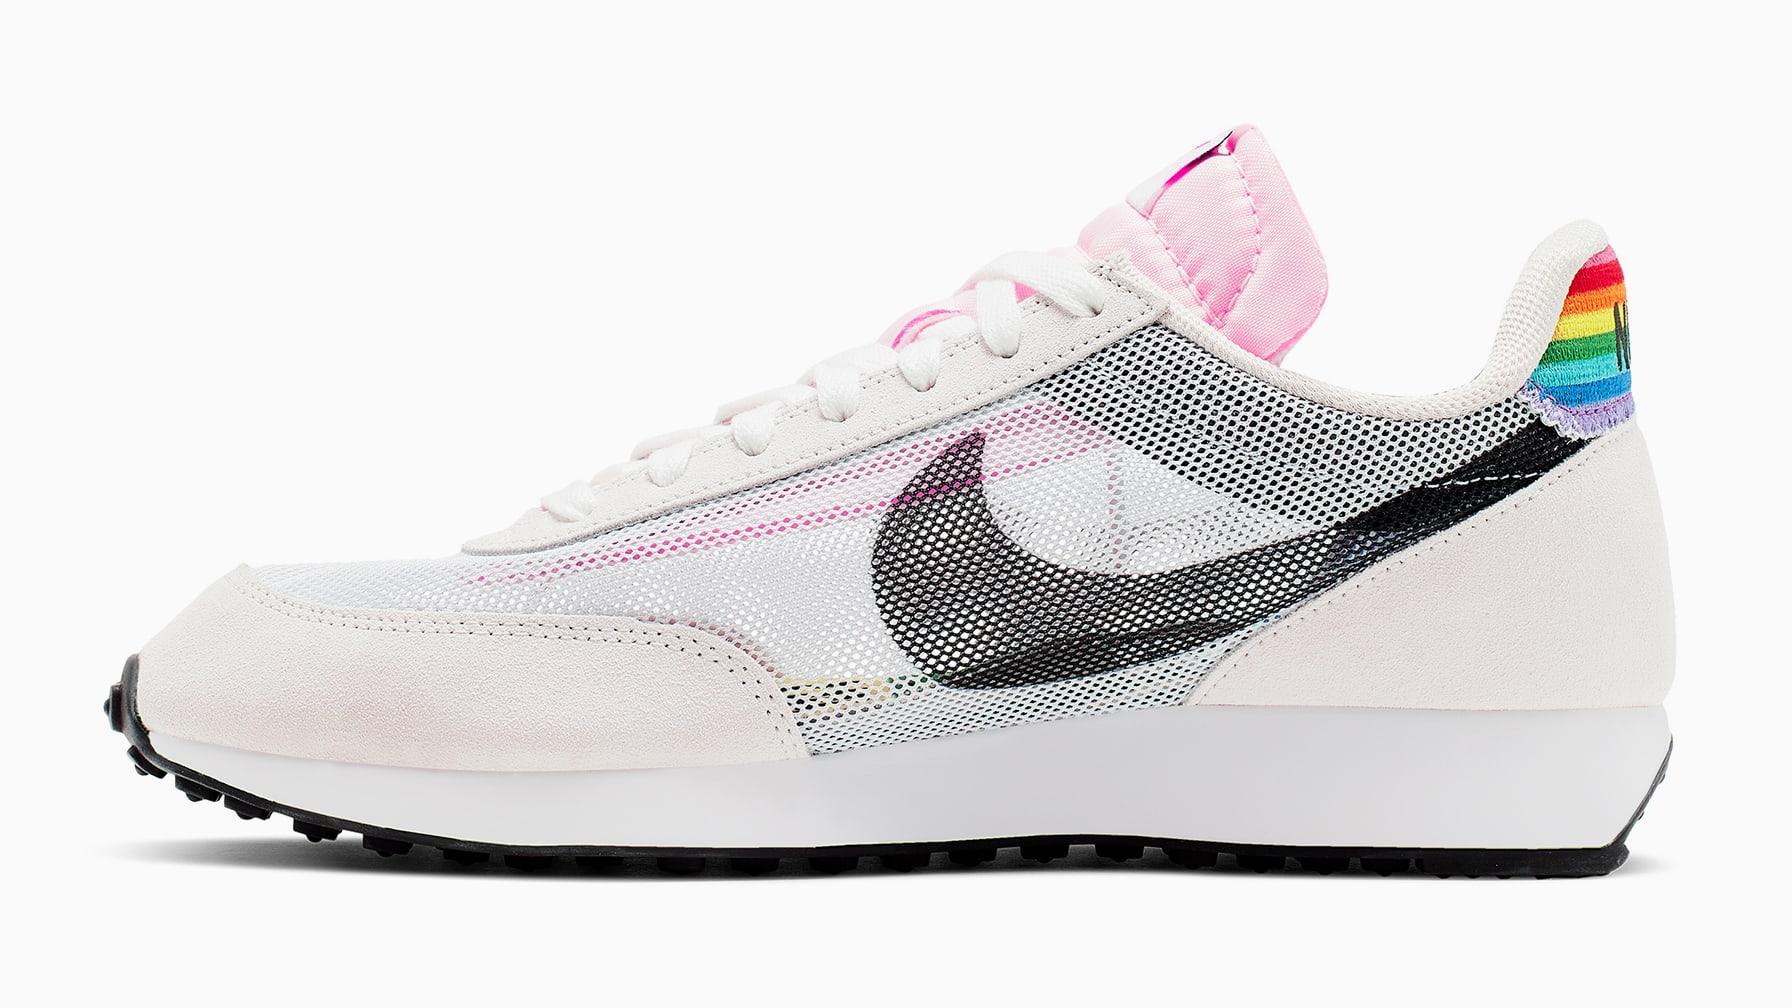 Nike Tailwind Be True Profile